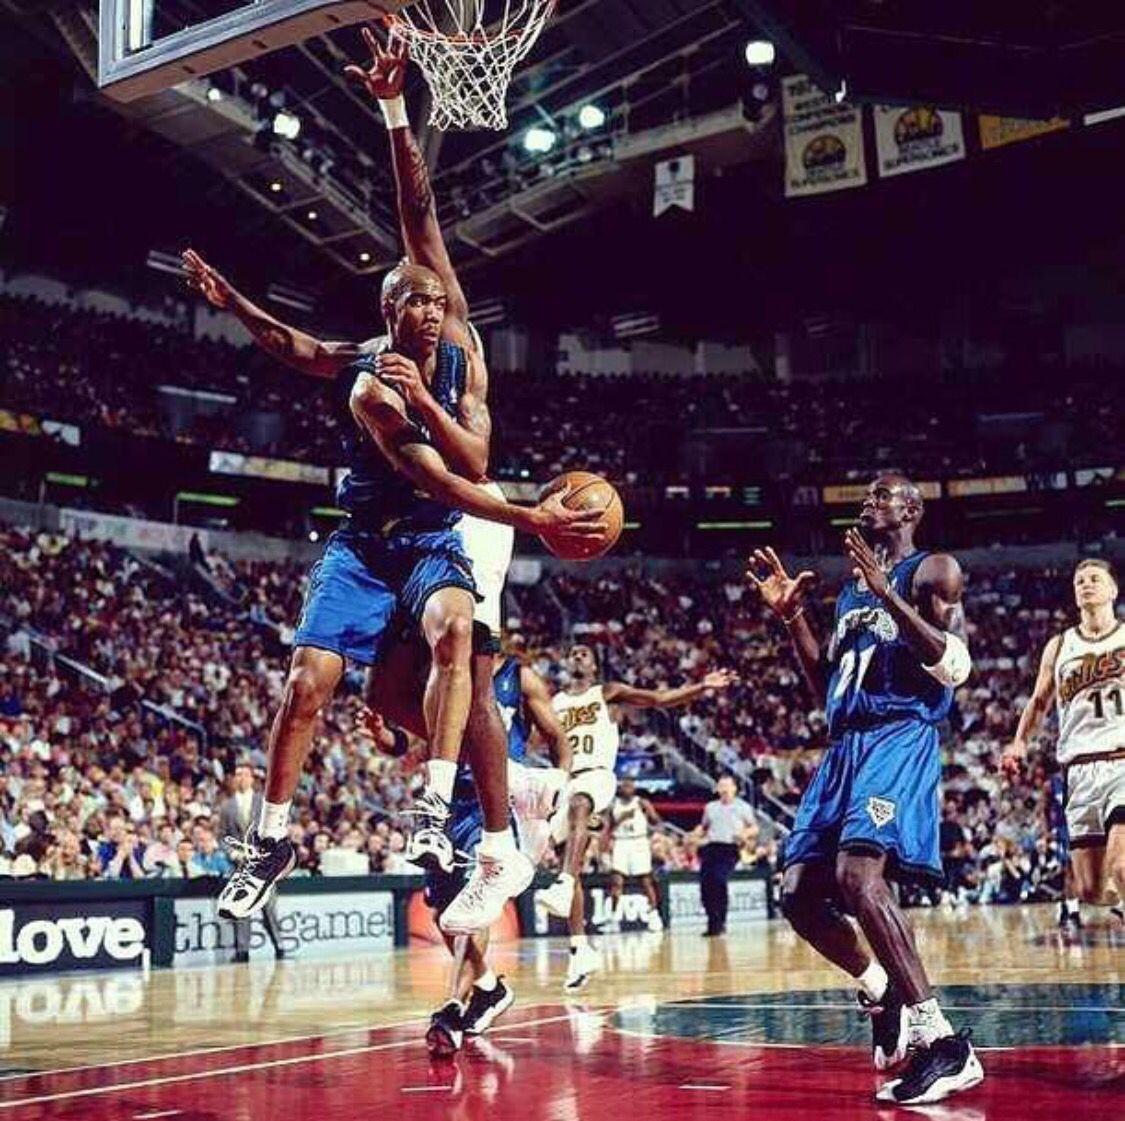 Steph & KG   Nba pictures, Kevin garnett, Basketball is life